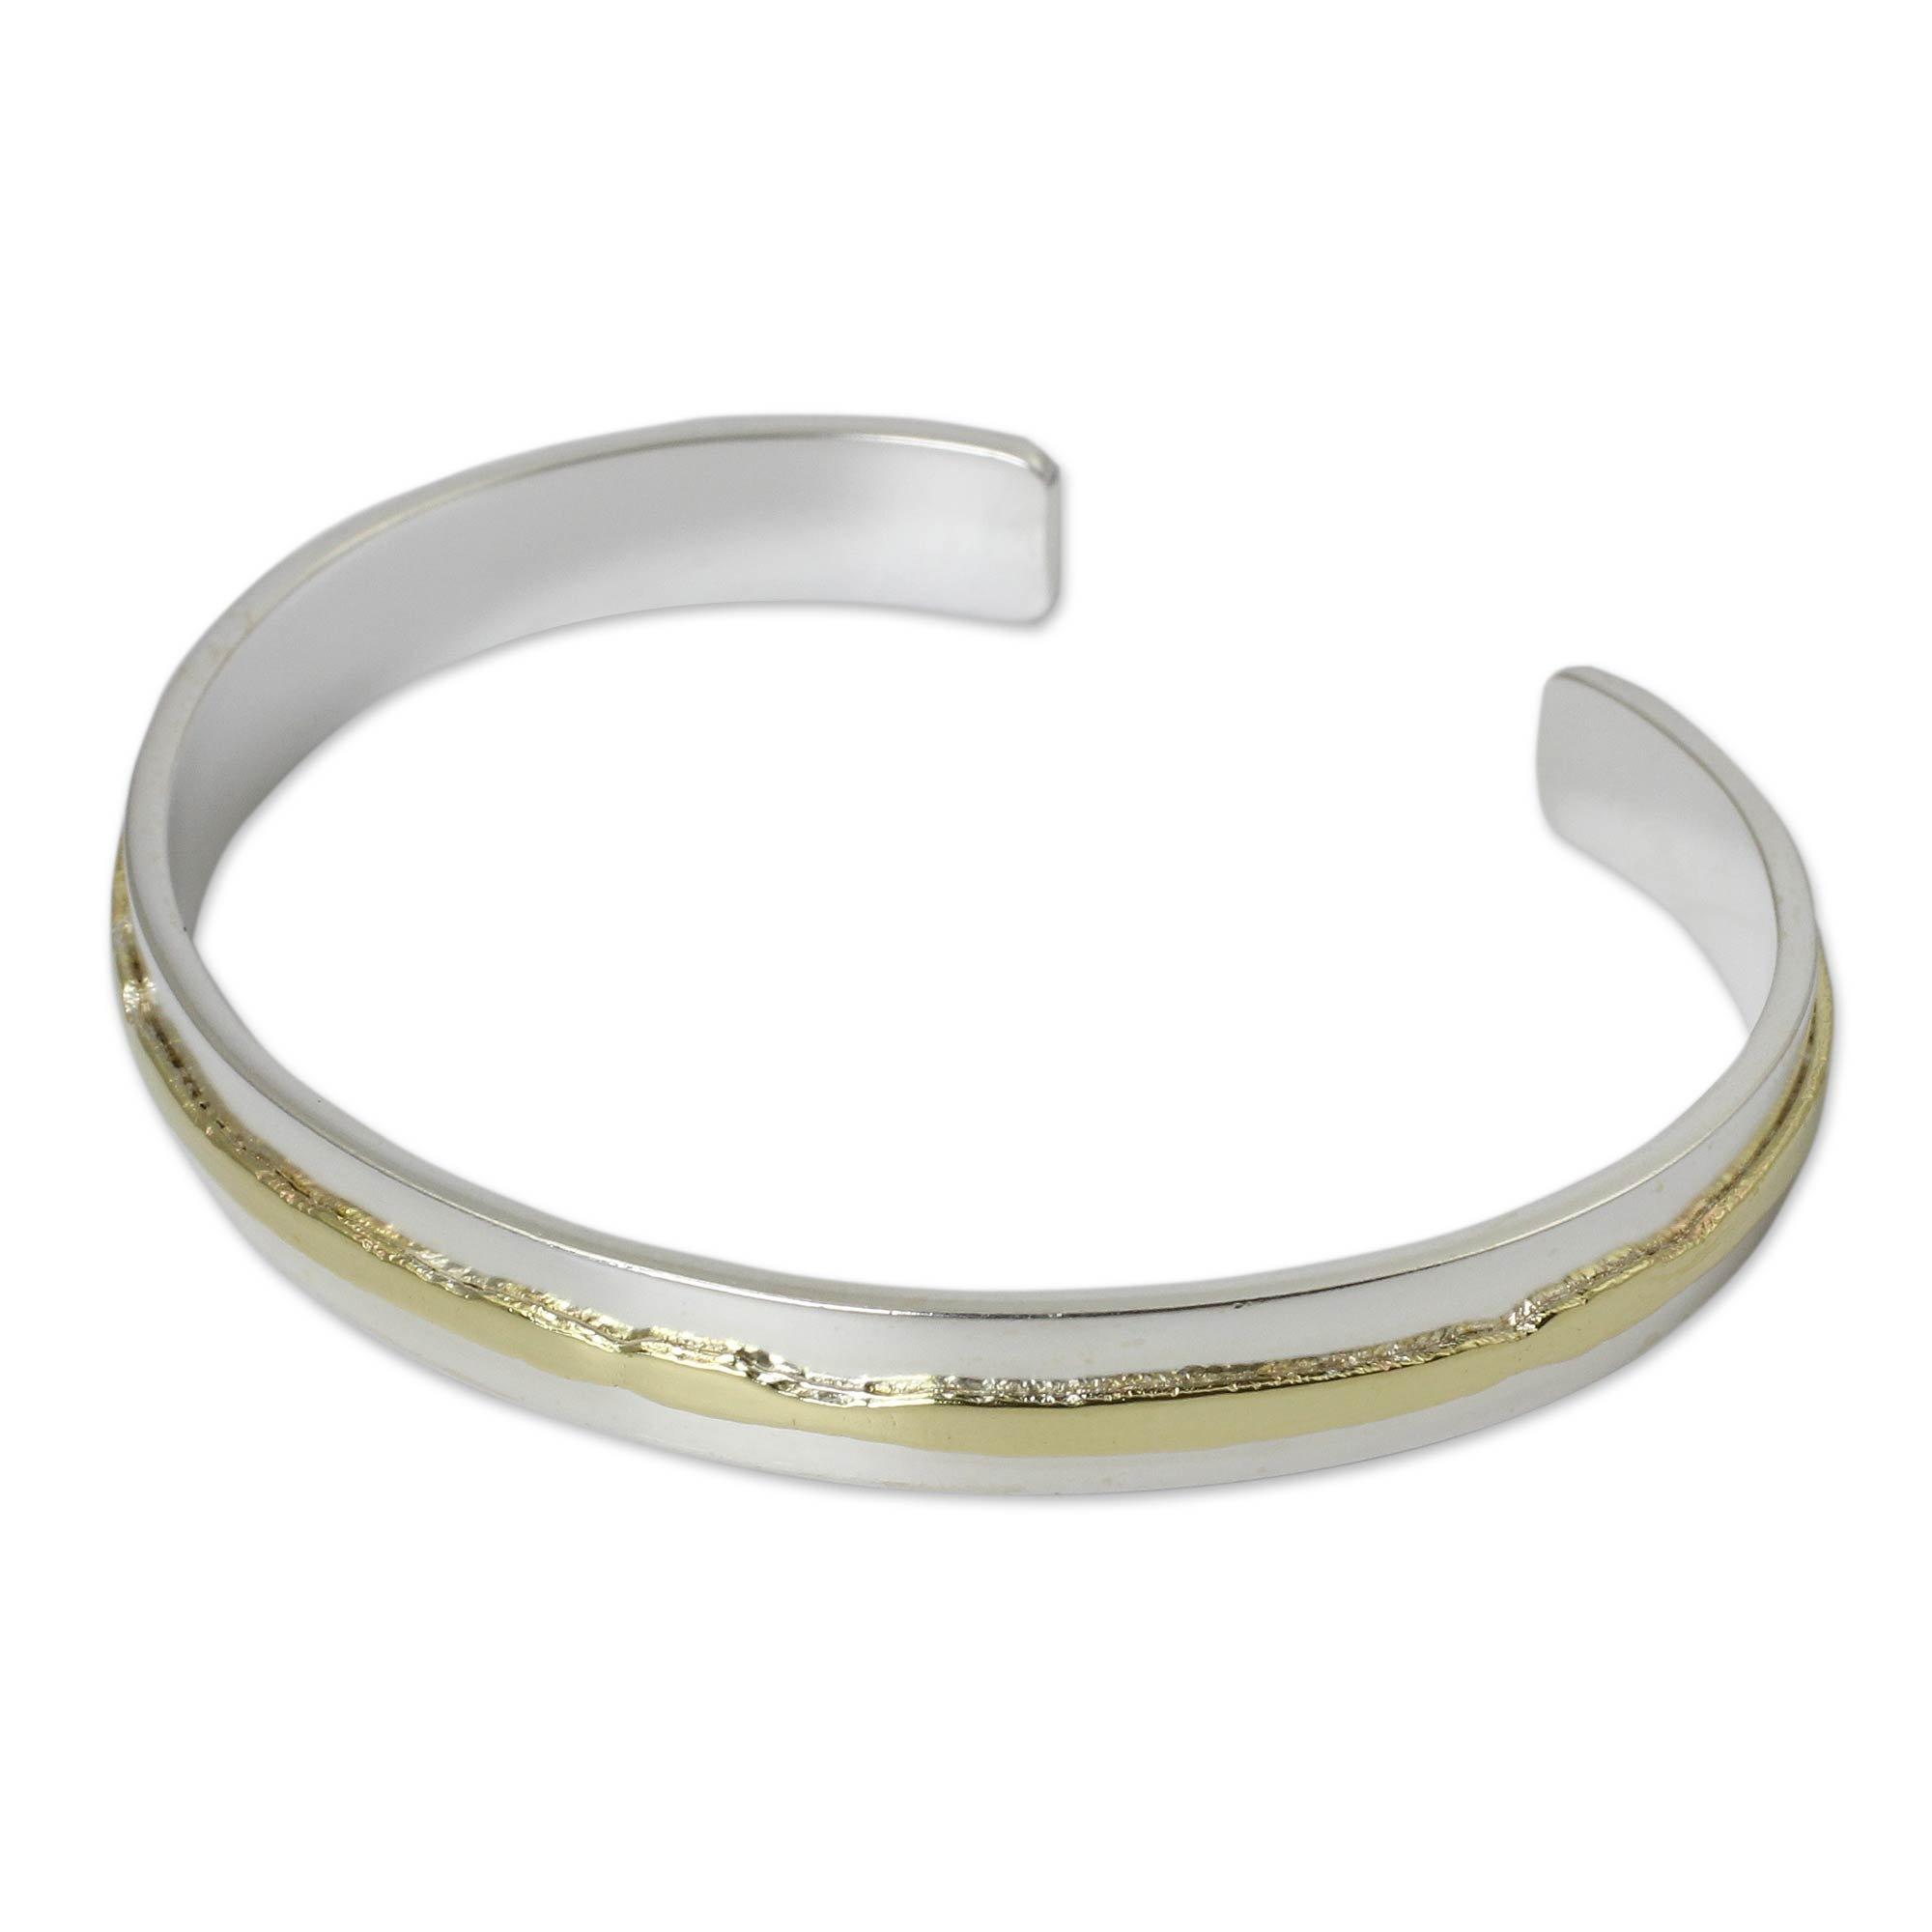 NOVICA 18k Gold Plated .925 Sterling Silver Cuff Bracelet 'Ripple Effect II'